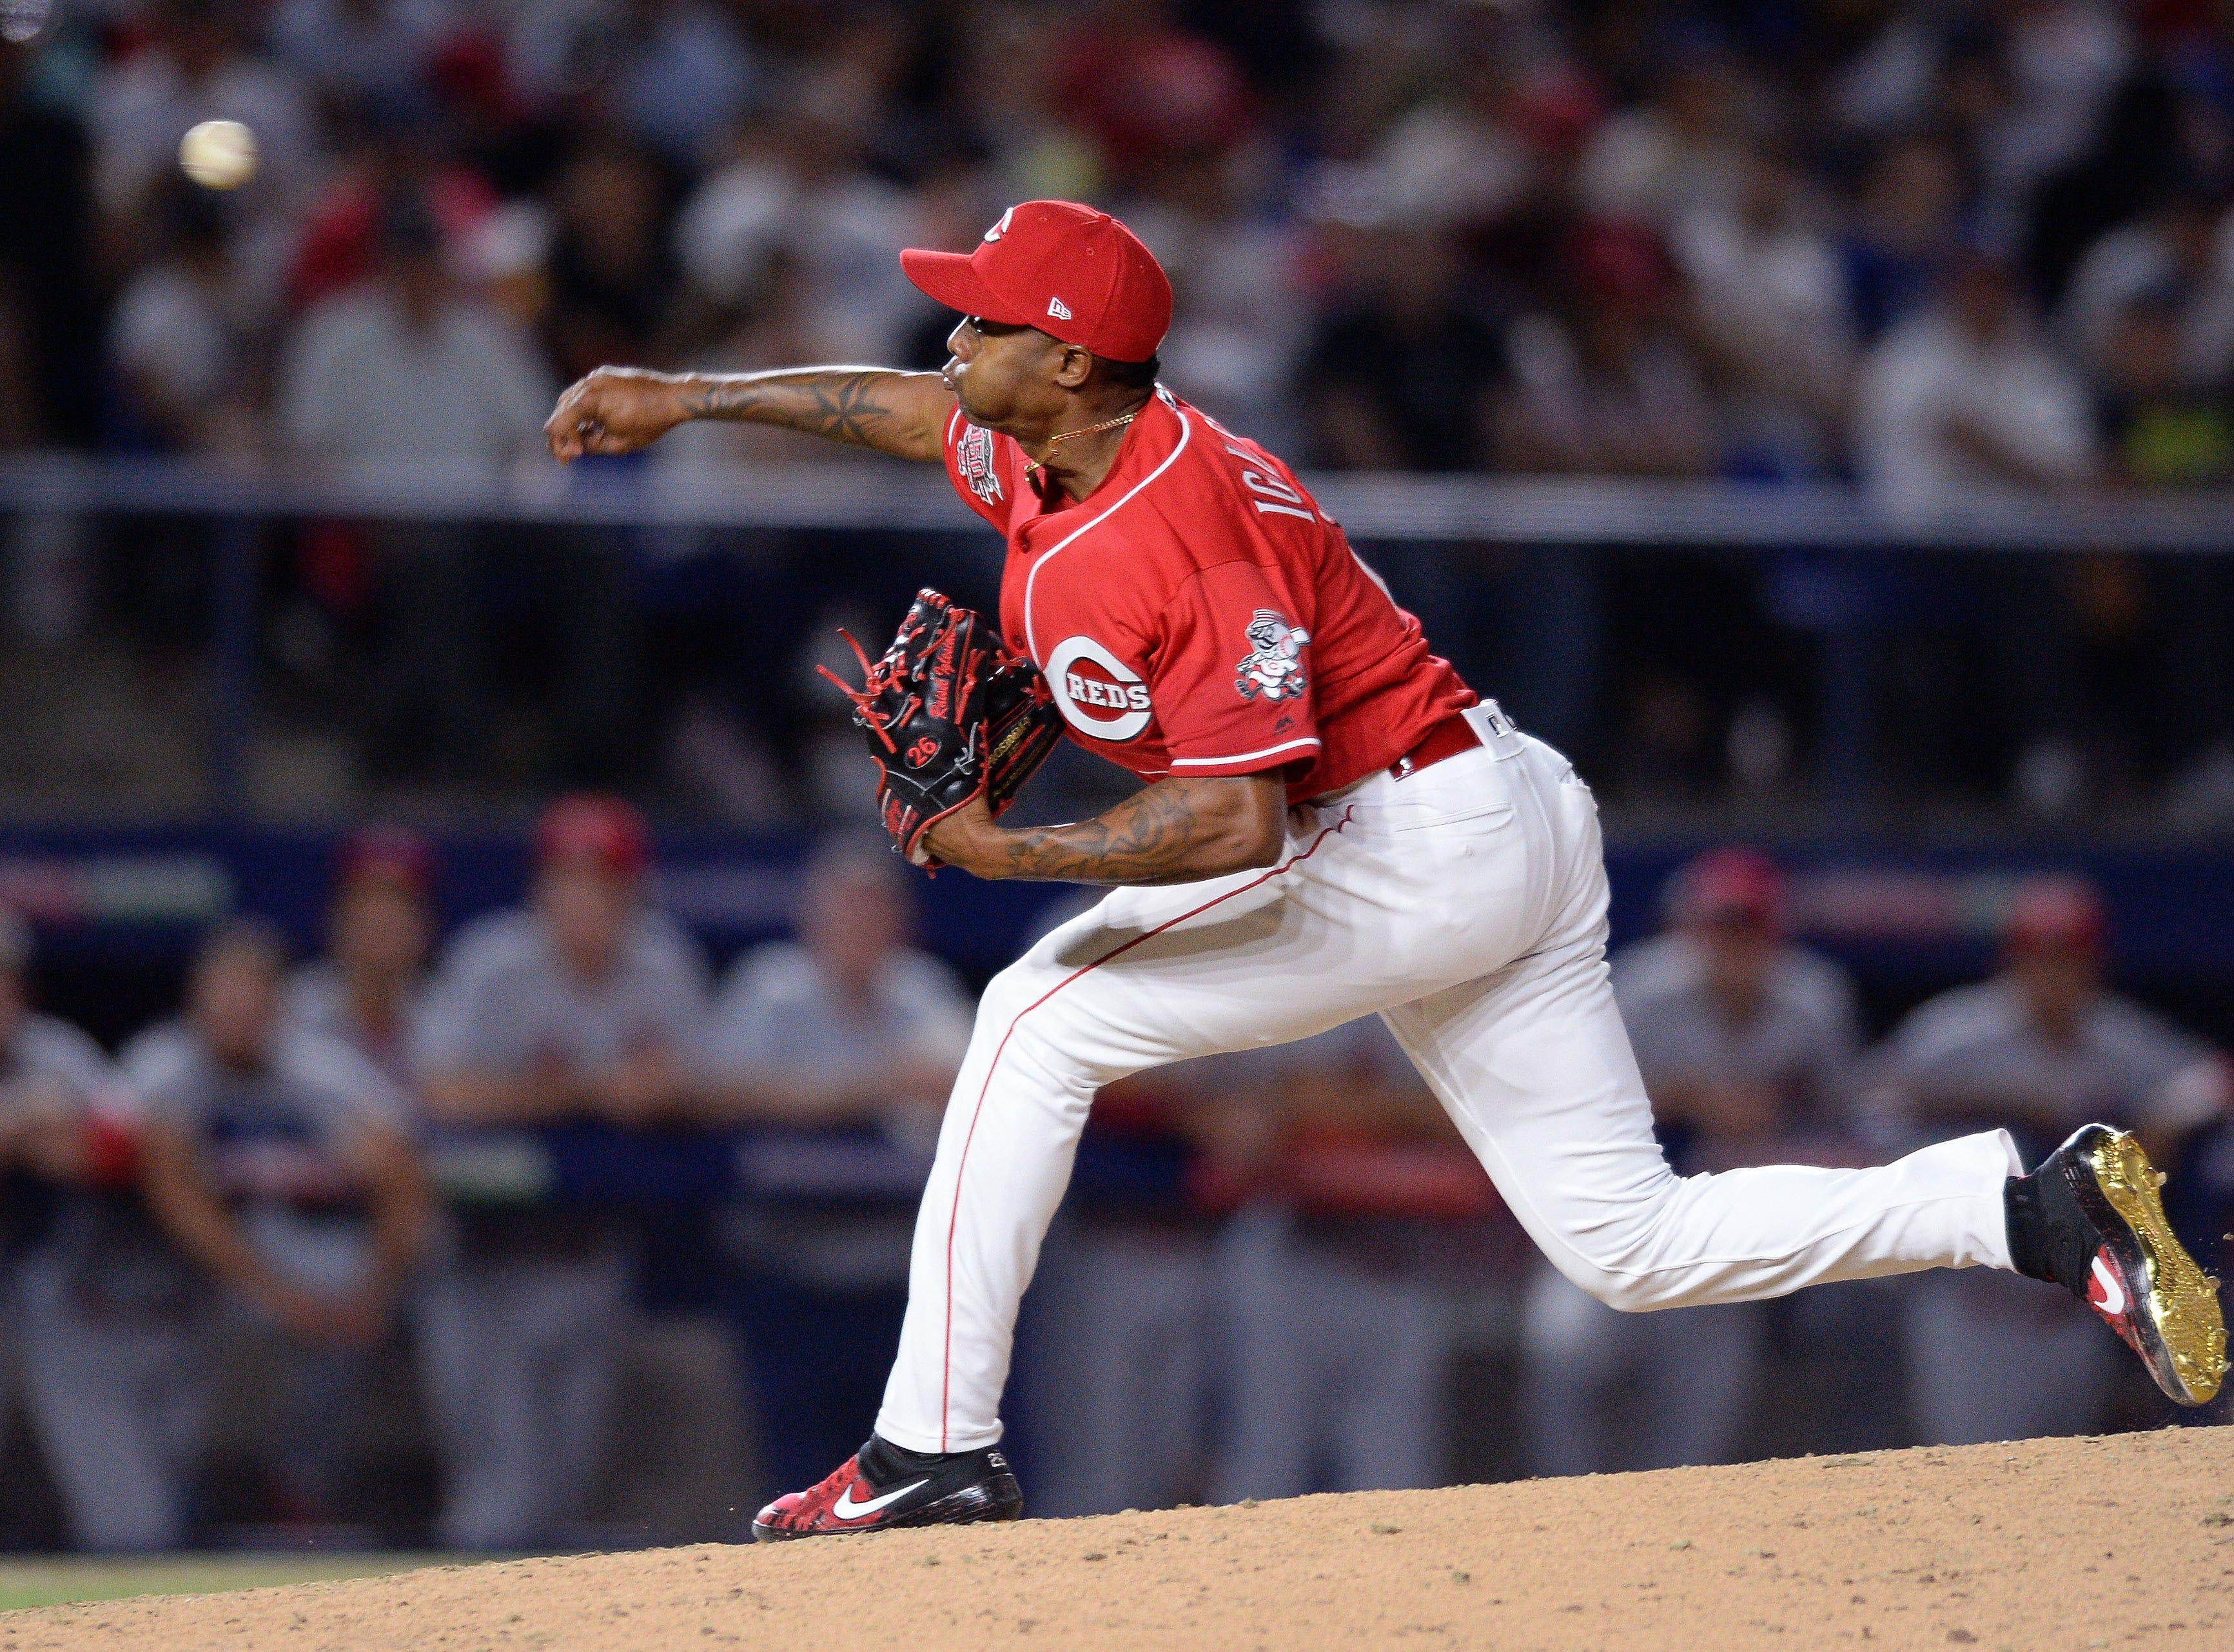 Cincinnati Reds relief pitcher Raisel Iglesias (26) works against a St. Louis Cardinals batter during the ninth inning at Estadio de Beisbol Monterrey.